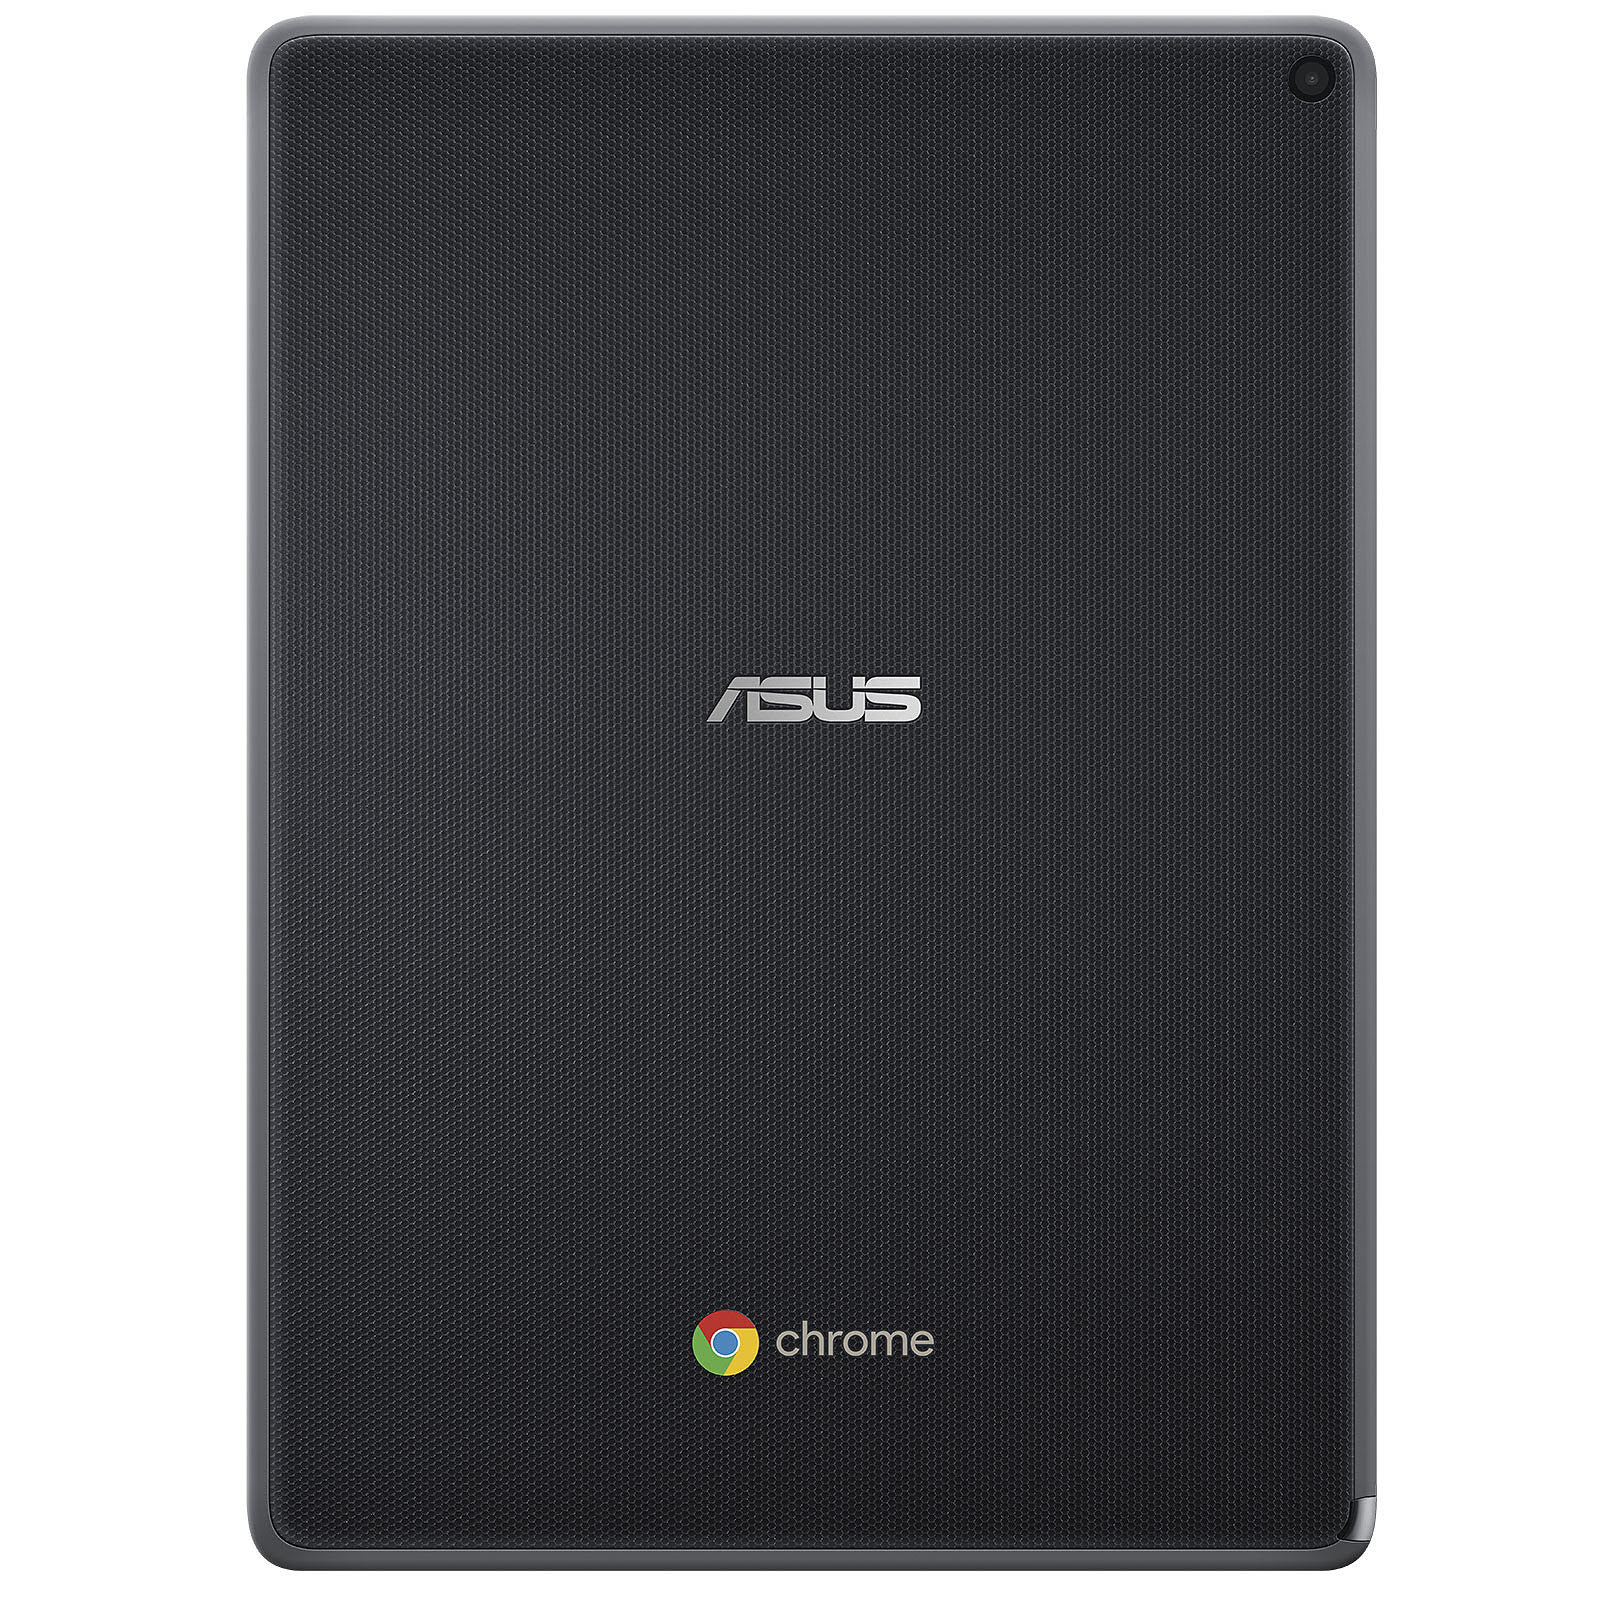 Chromebook CT100 CT100PA-AW0016 (90NX02B1-M00270) - Achat / Vente Tablette tactile sur Picata.fr - 2